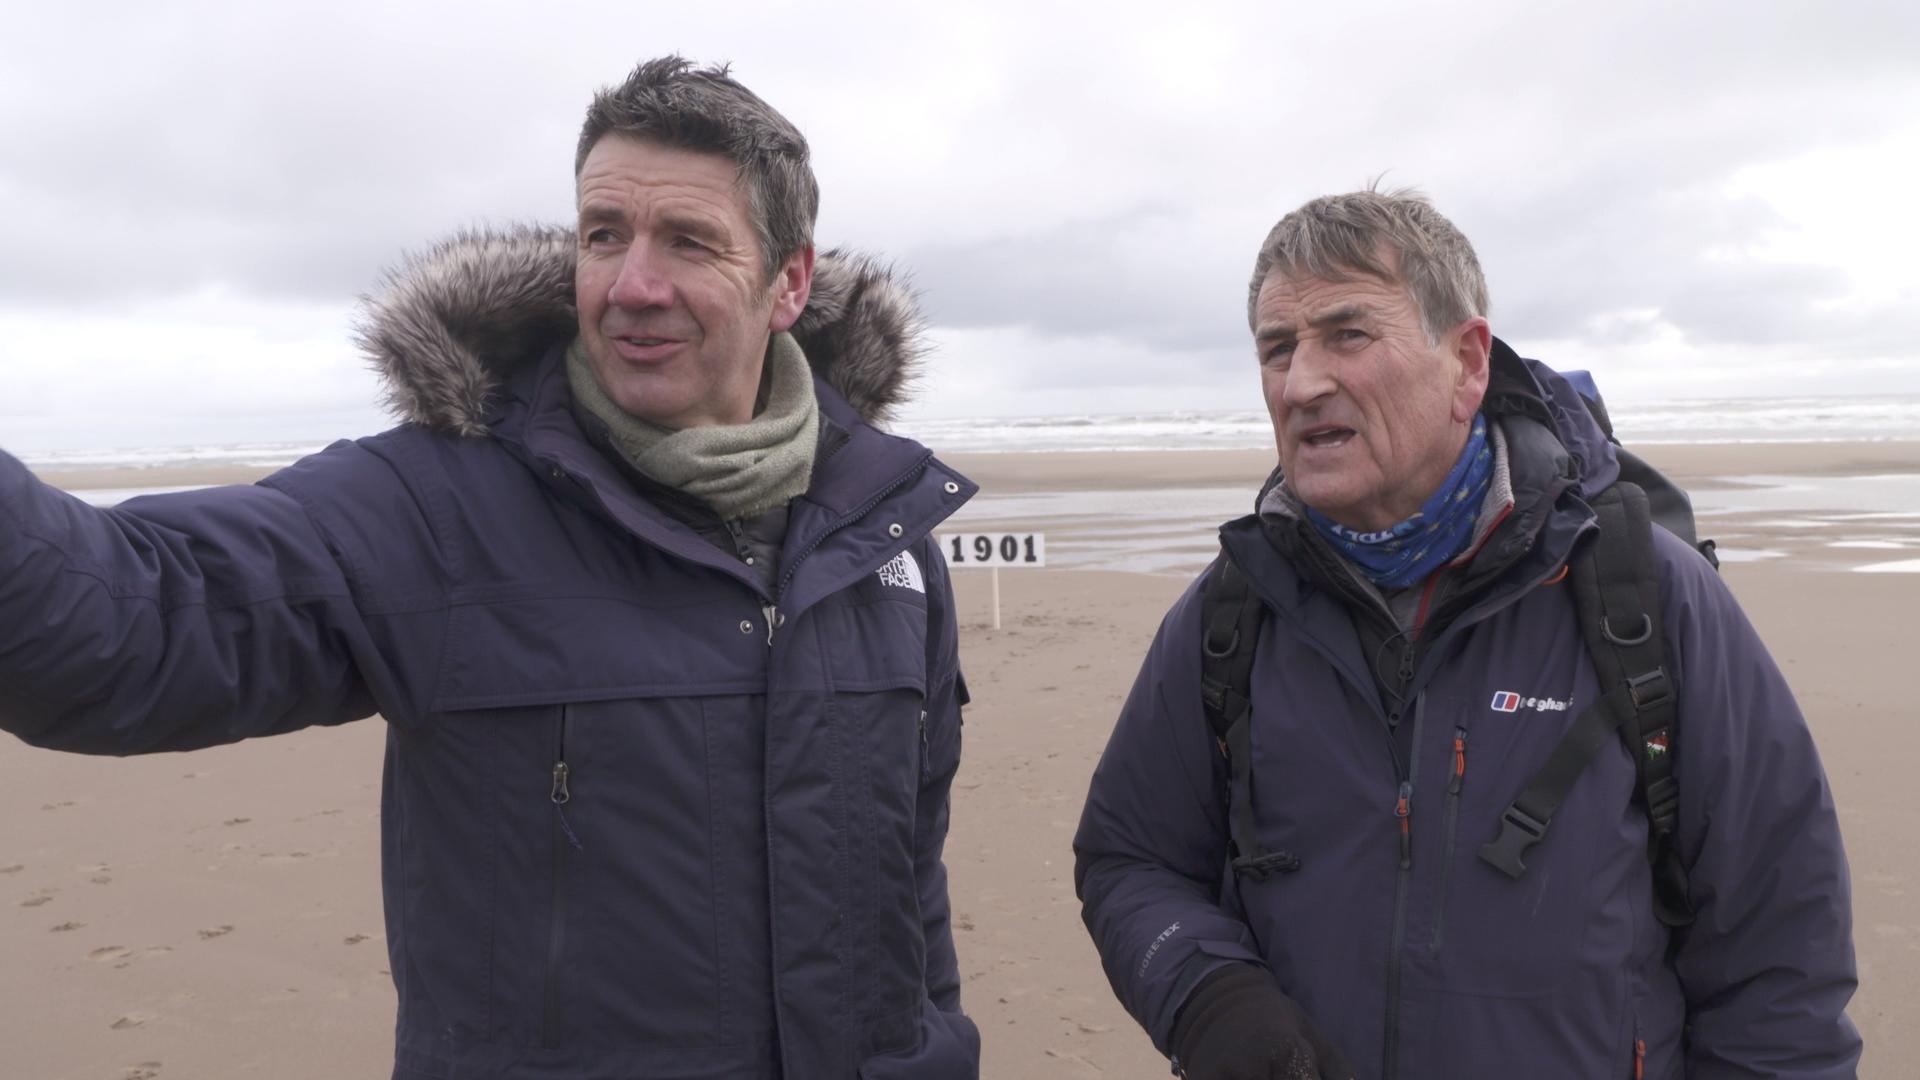 Landward presenter Dougie Vipond and Dr Jim Hansom